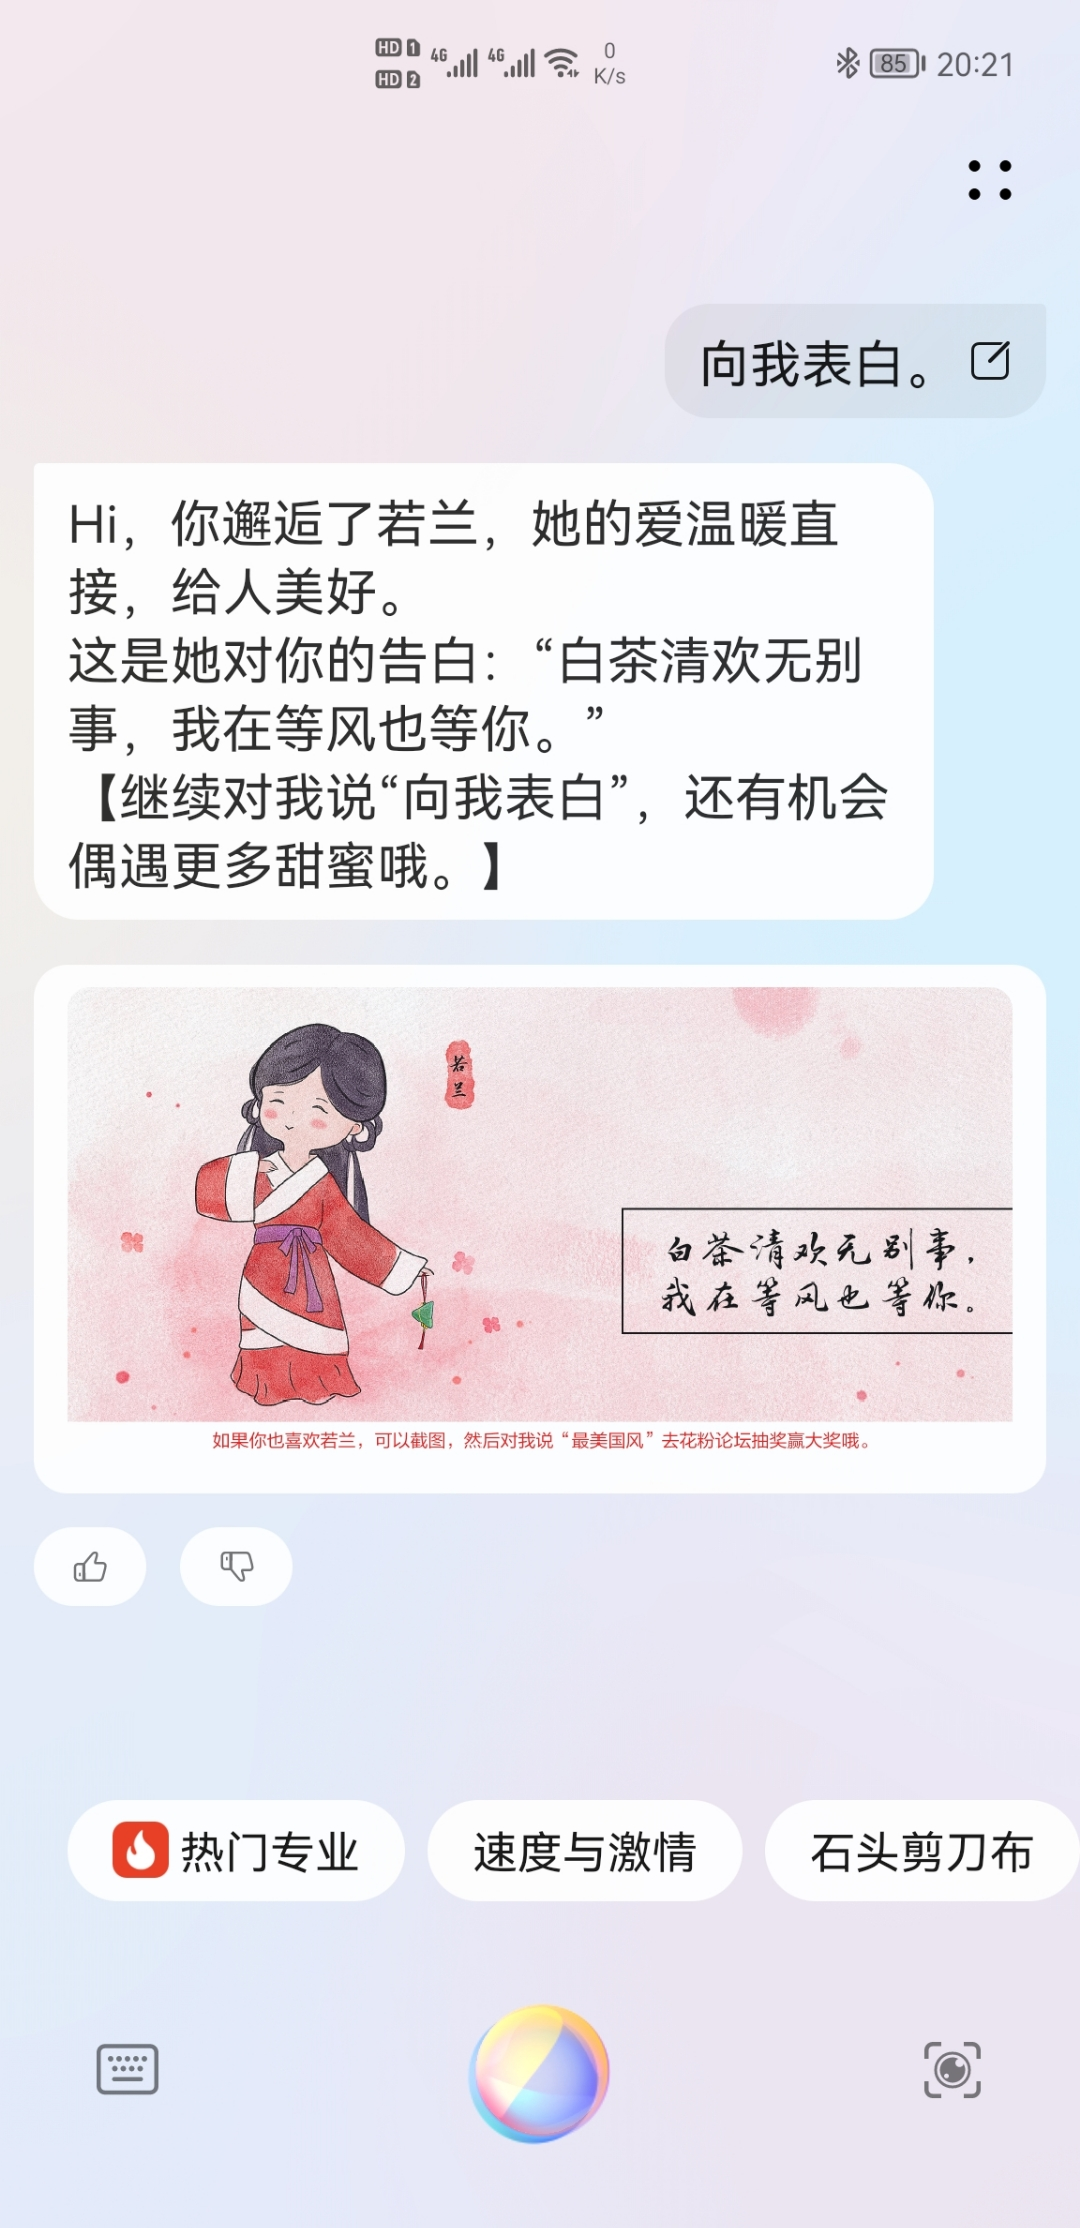 Screenshot_20210611_202144_com.huawei.vassistant.jpg